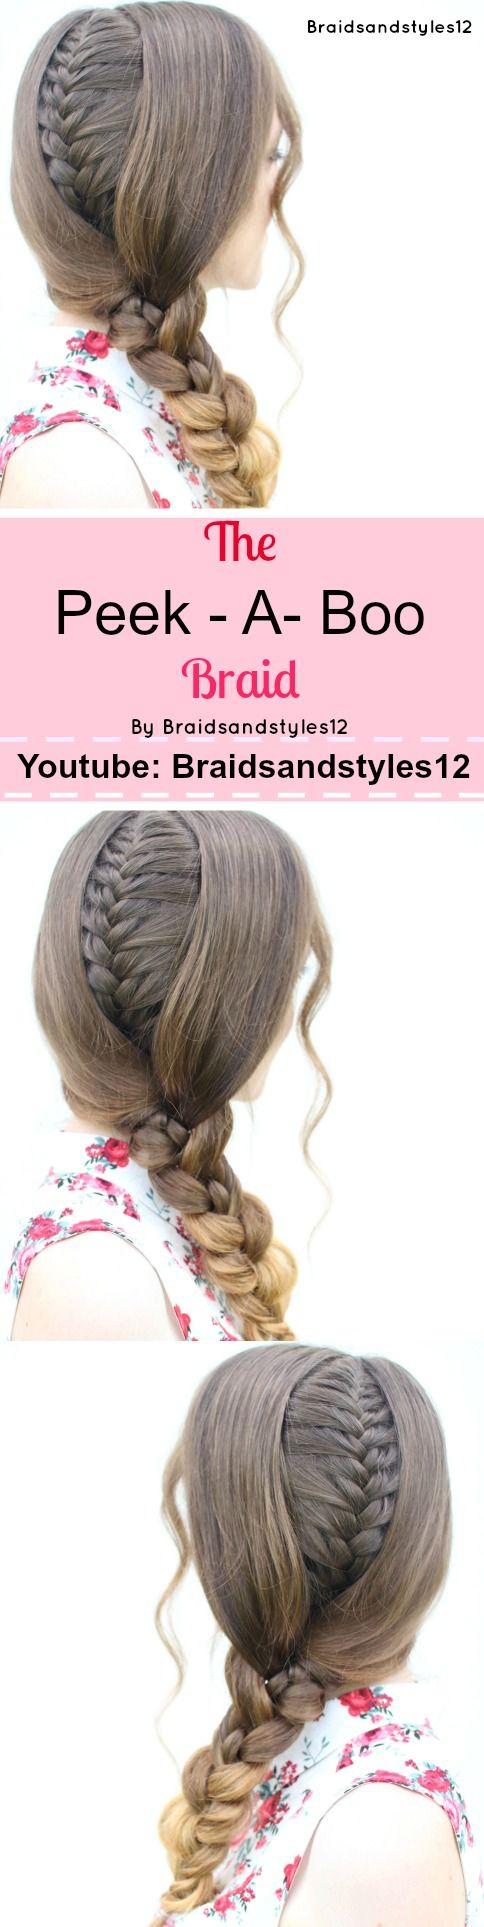 352 best braidsandstyles12 images on pinterest hair tutorials the peekaboo braid by braidsandstyles12 youtube tutorial https youtube ccuart Choice Image